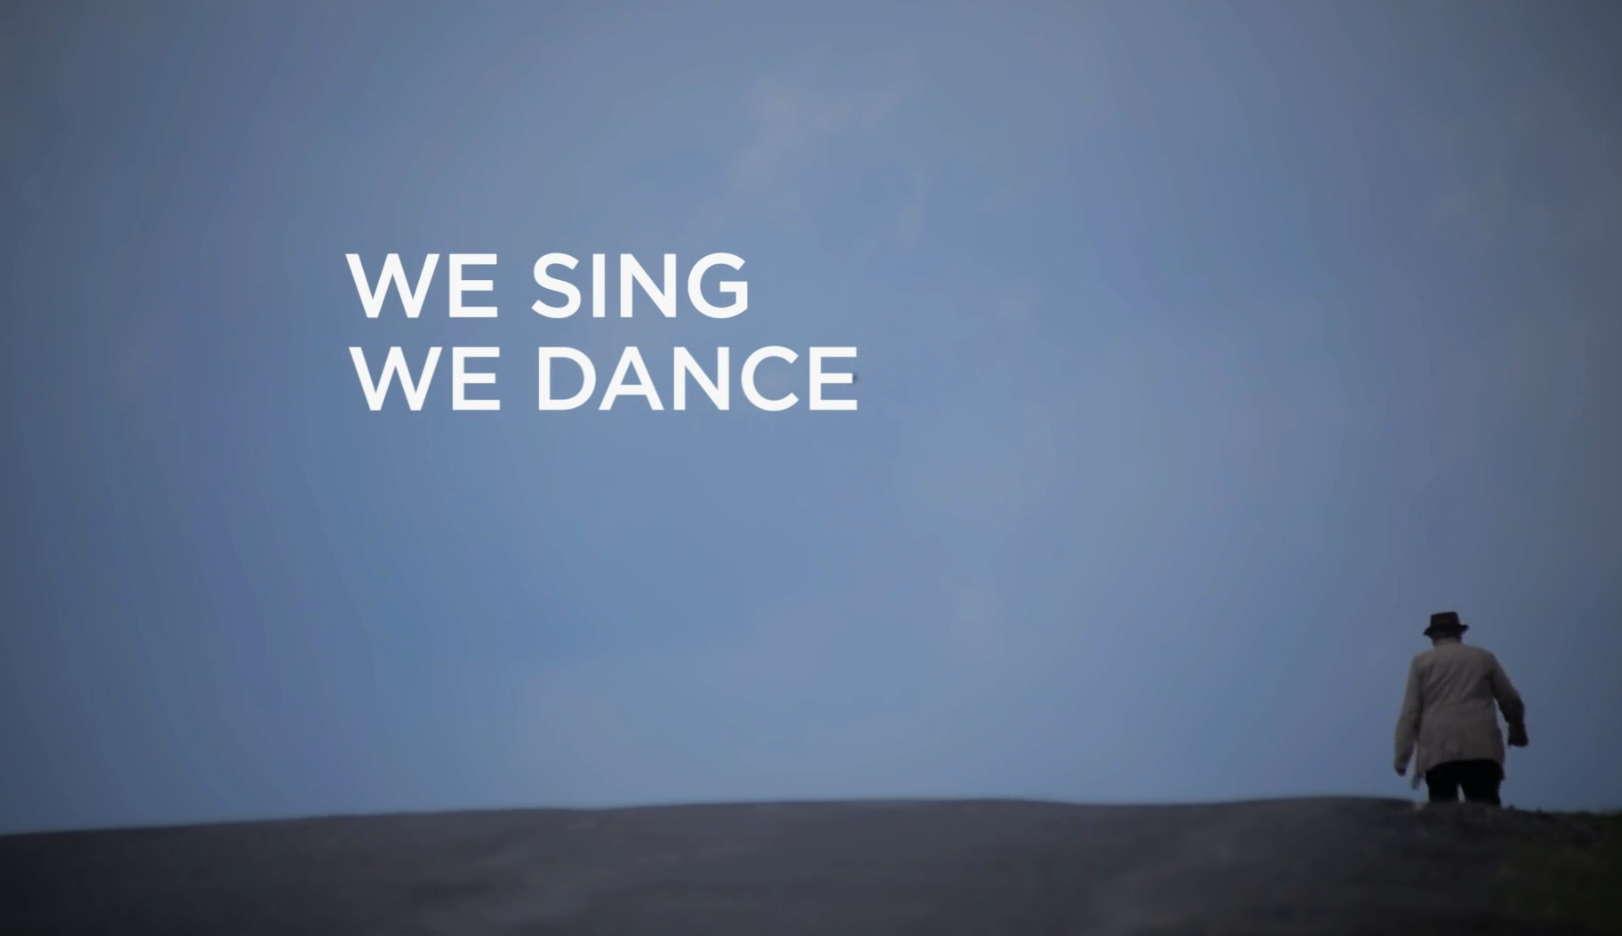 Wesing wedance